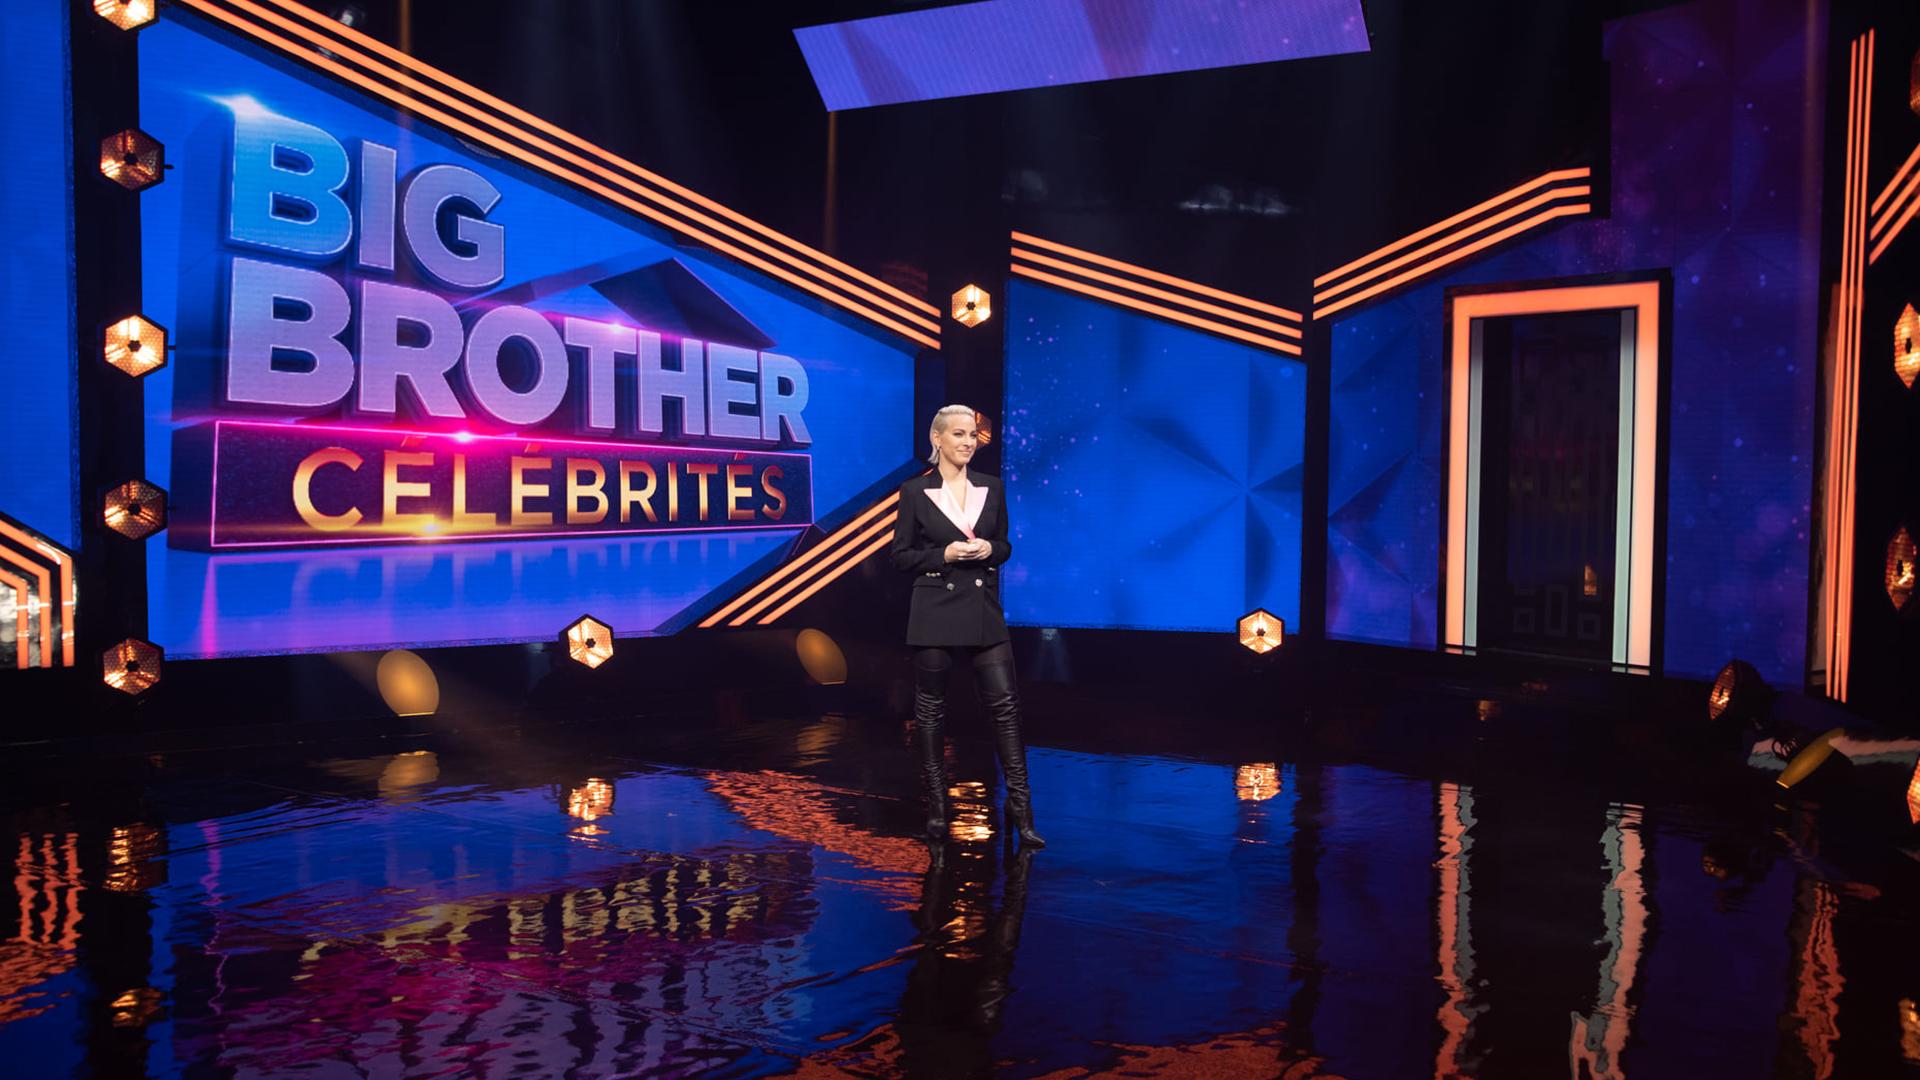 Big Brother Celebrites (TV Series 2021 - Now)